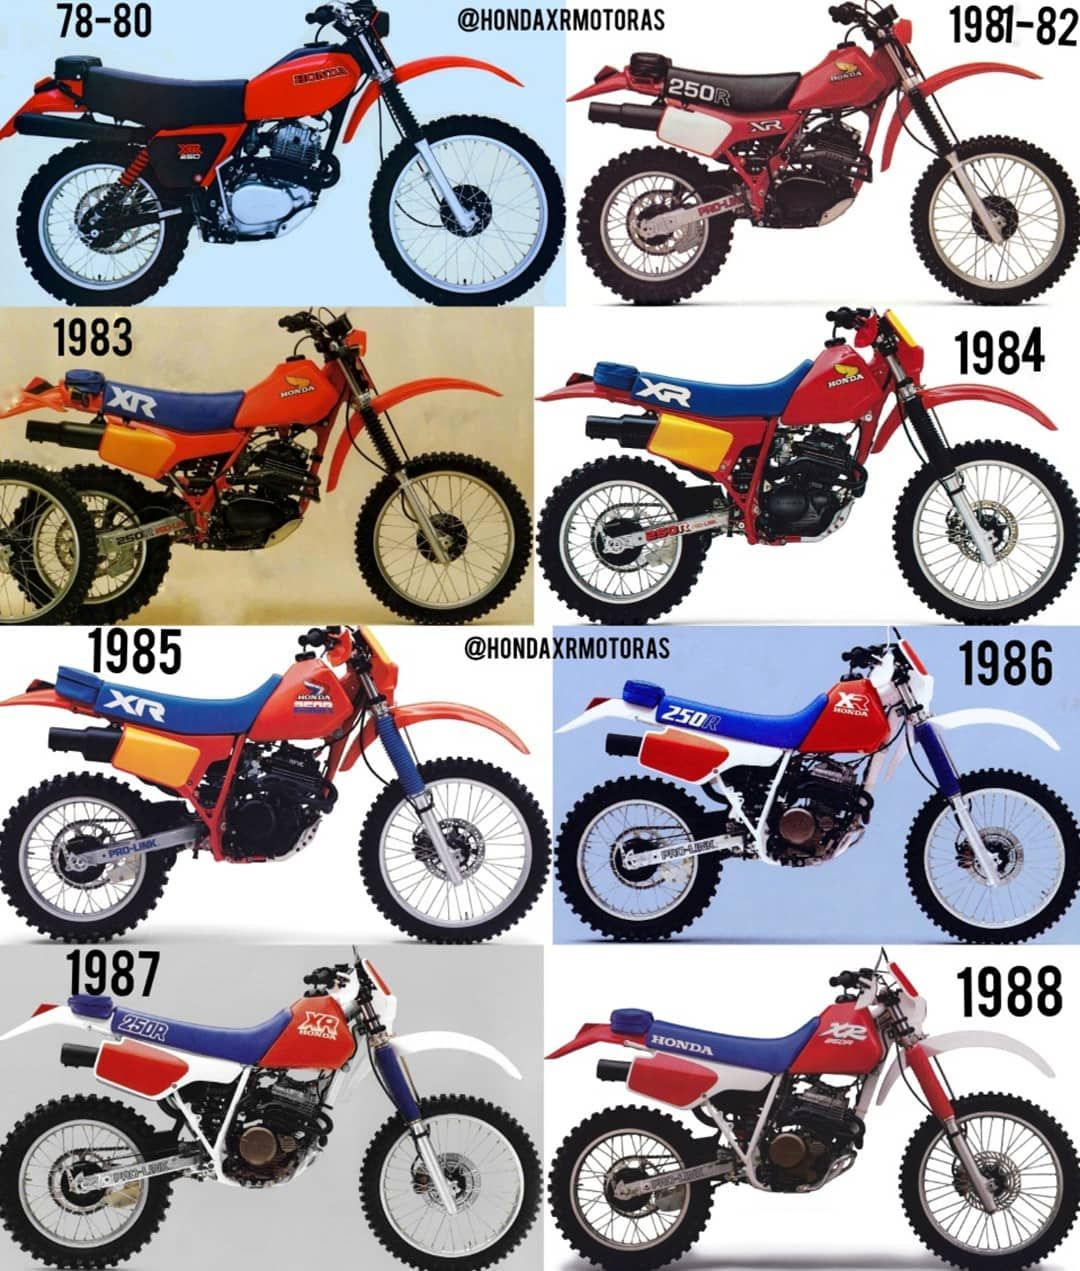 Pin By Greg Nelson On Sick Mx In 2020 Honda Dirt Bike Honda Enduro Motorcycle